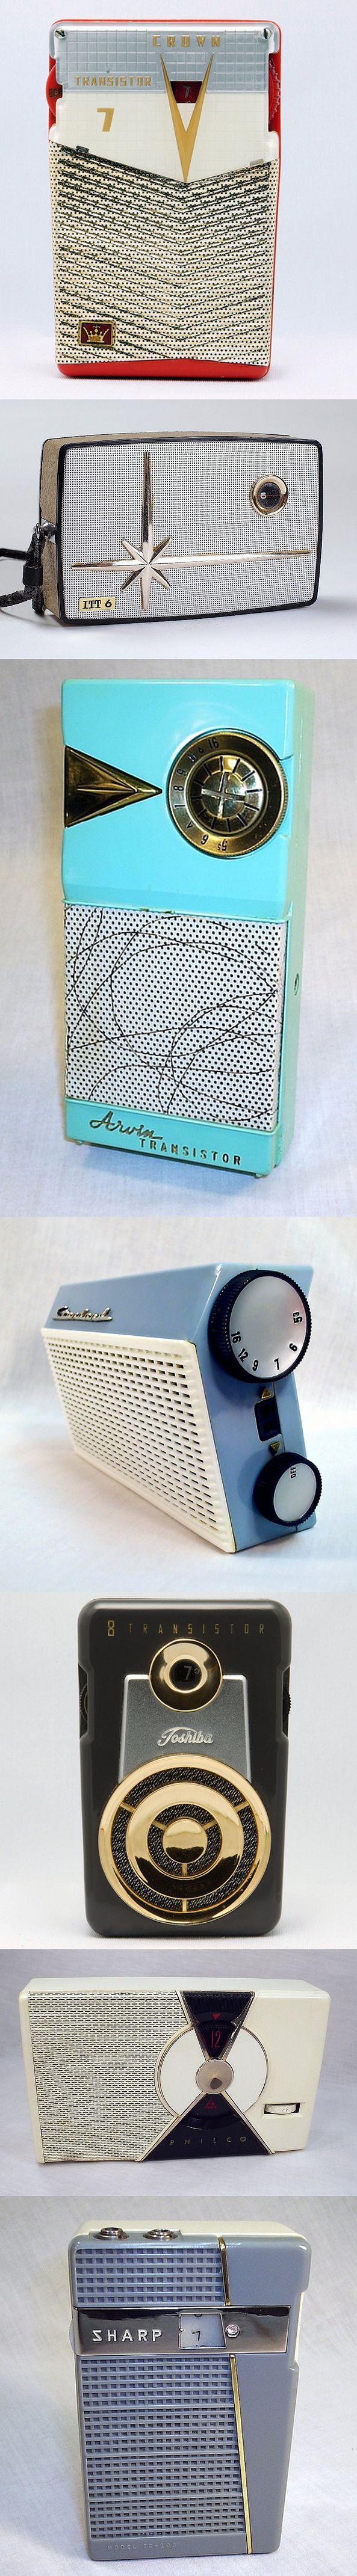 Transistor Radios 50 S 1950 S Mid Century Portable Radio Vintage Retro Antique 50er Jahre Modern Technik